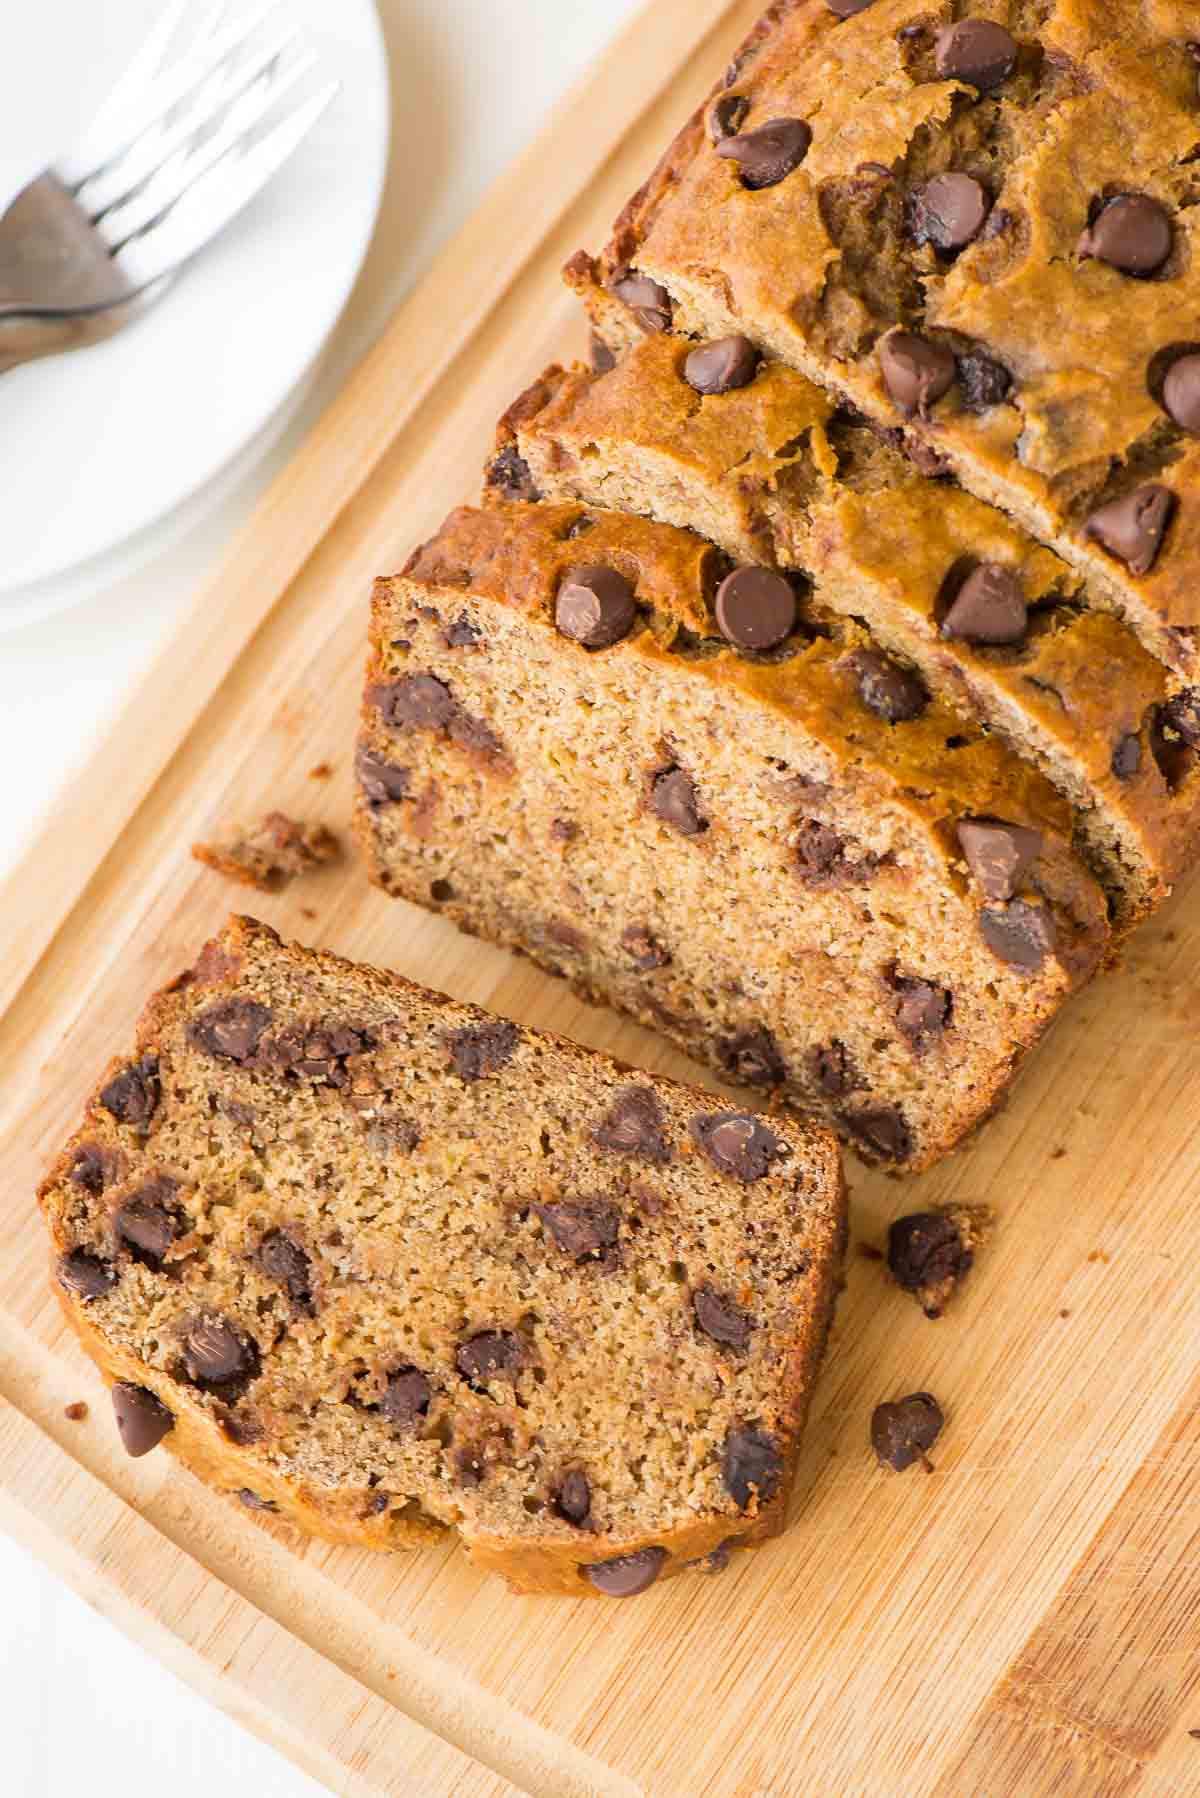 Healthy Banana Bread With Yogurt  Healthy Banana Bread Recipe with Chocolate Chips